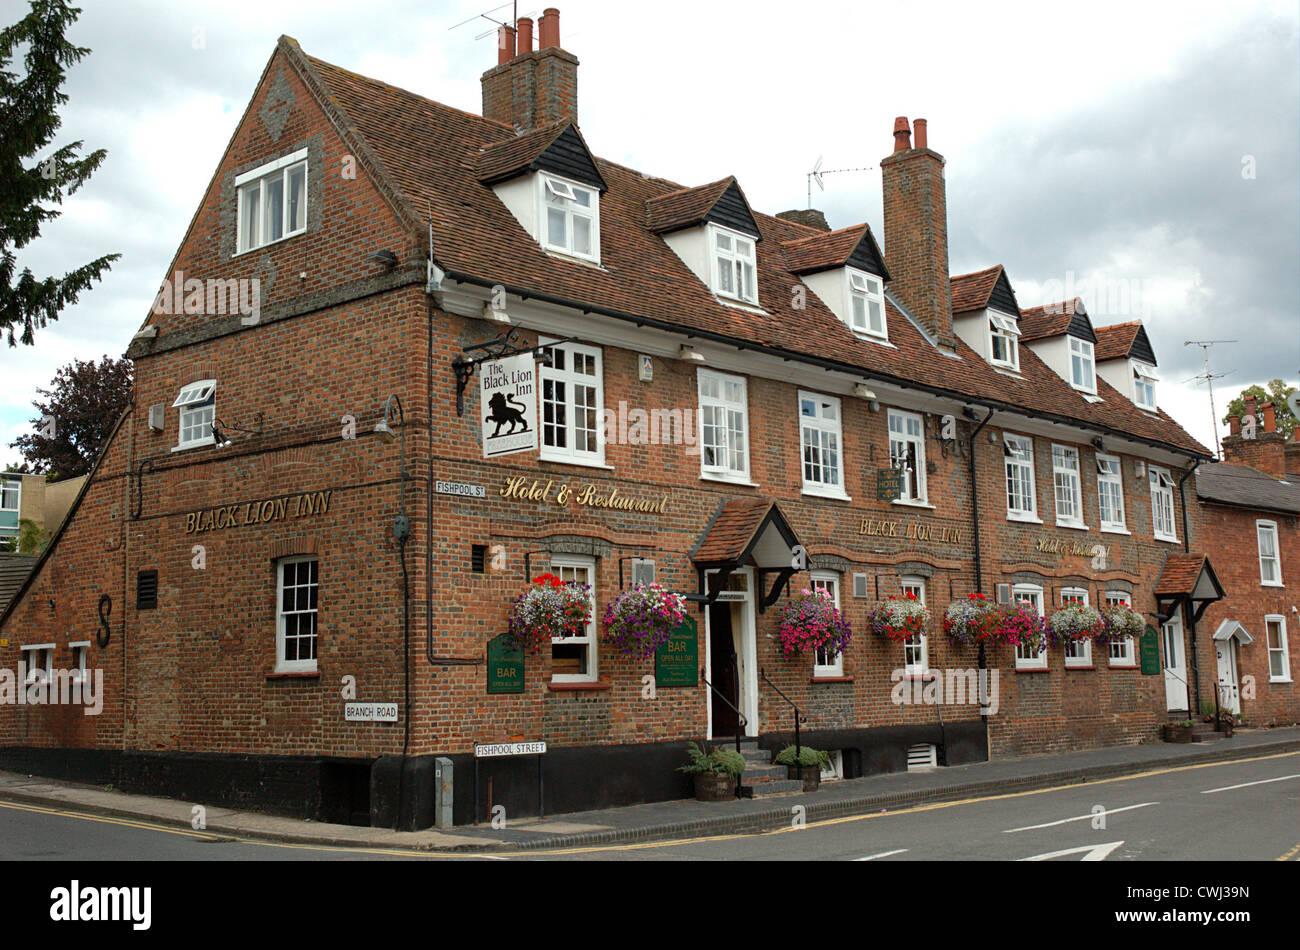 : The Black Lion Inn, corner of Fishpool Street and Branch Road, St Albans, Hertfordshire, England, UK - Stock Image